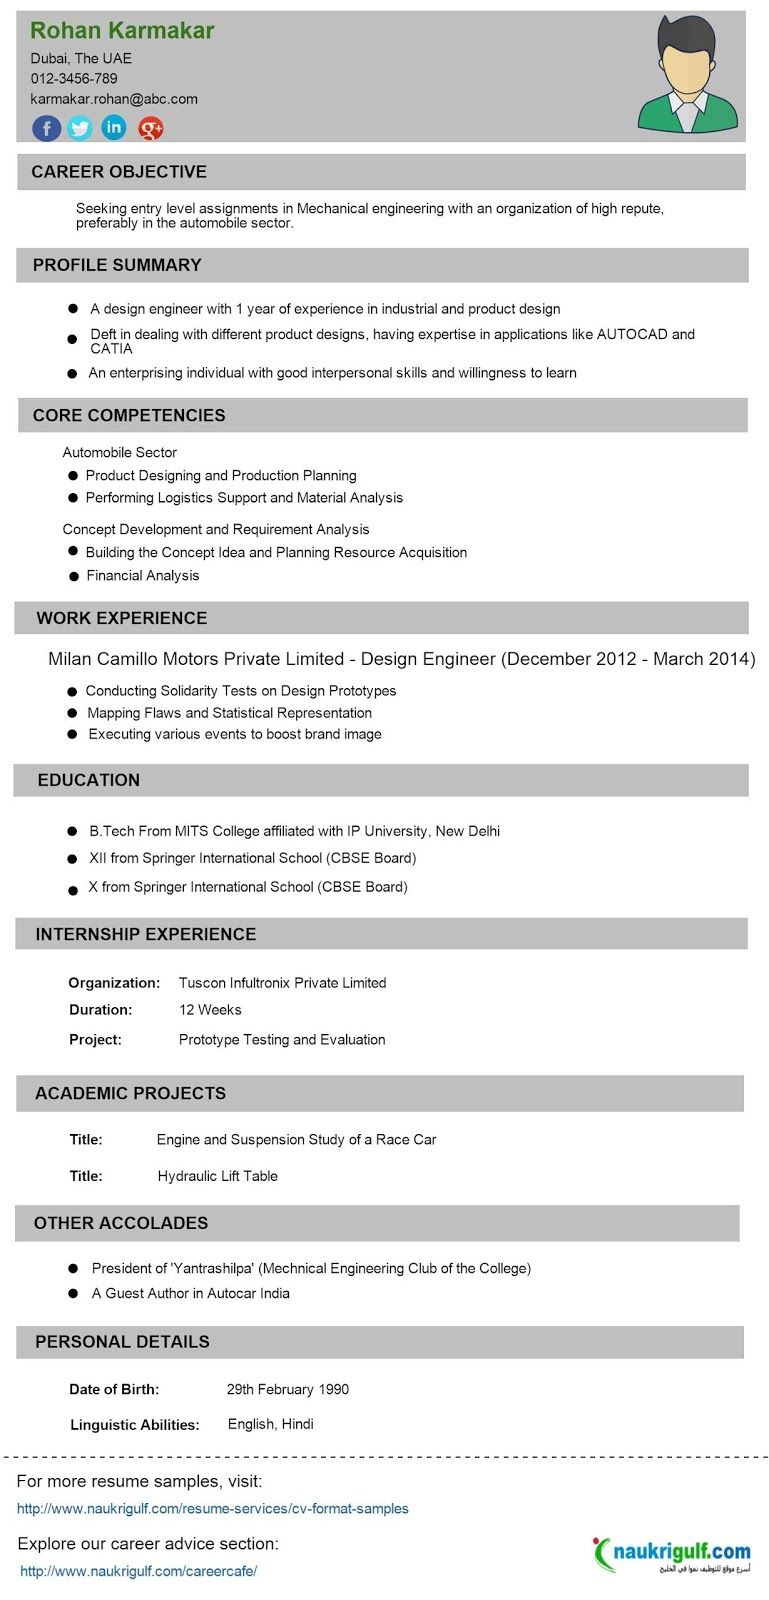 Mechanical Engineering Cv Format Mechanical Engineering Cv Format For Fresher Pdf Mechanical Engi Best Resume Format Resume Format Resume Format For Freshers